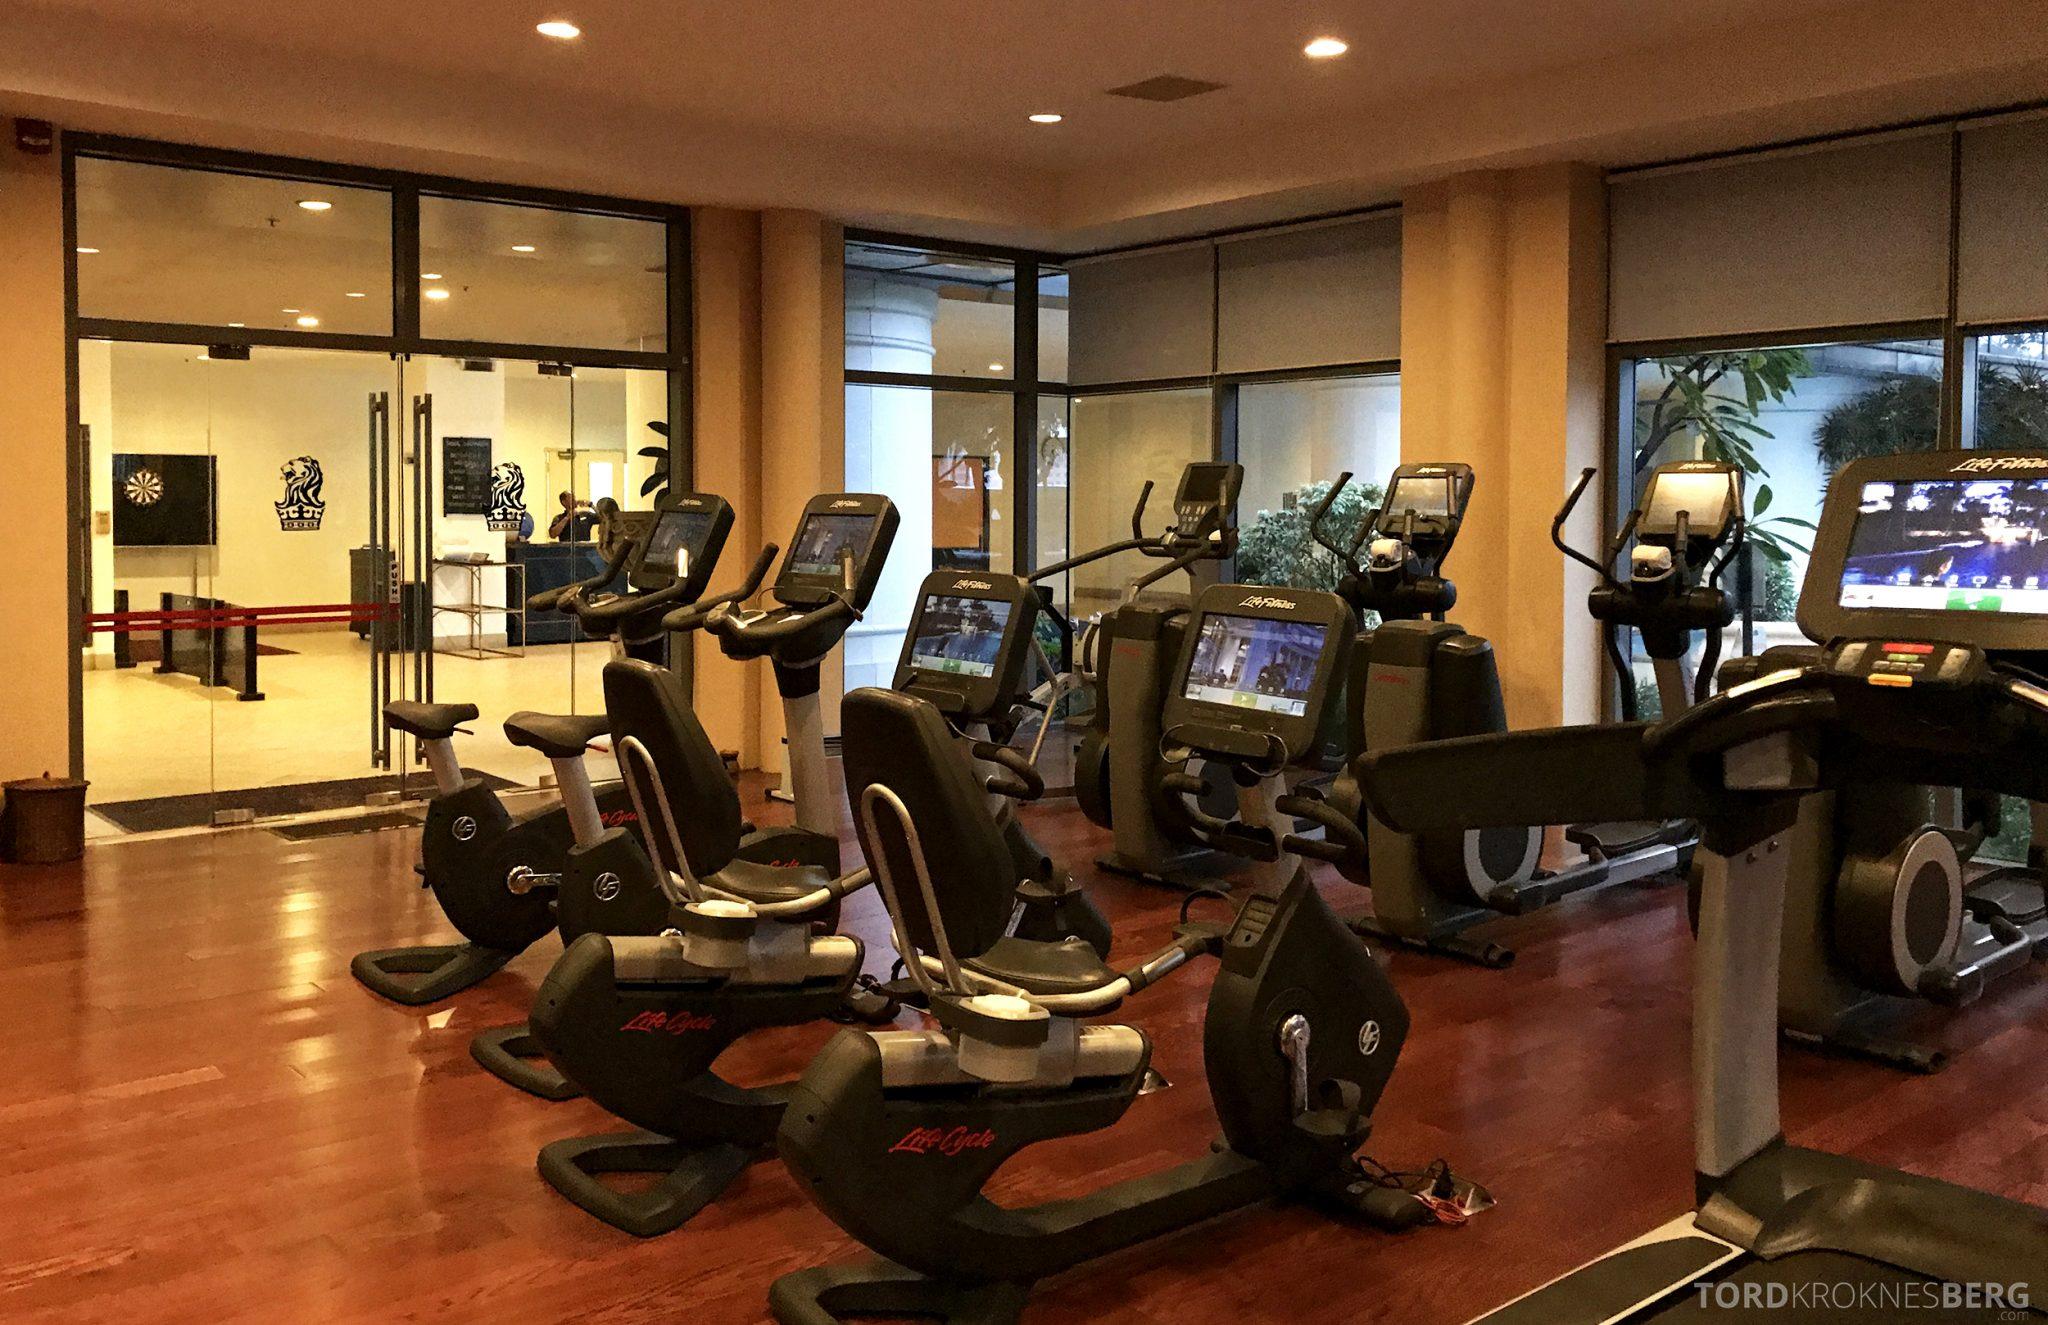 Ritz-Carlton Jakarta apparater trening